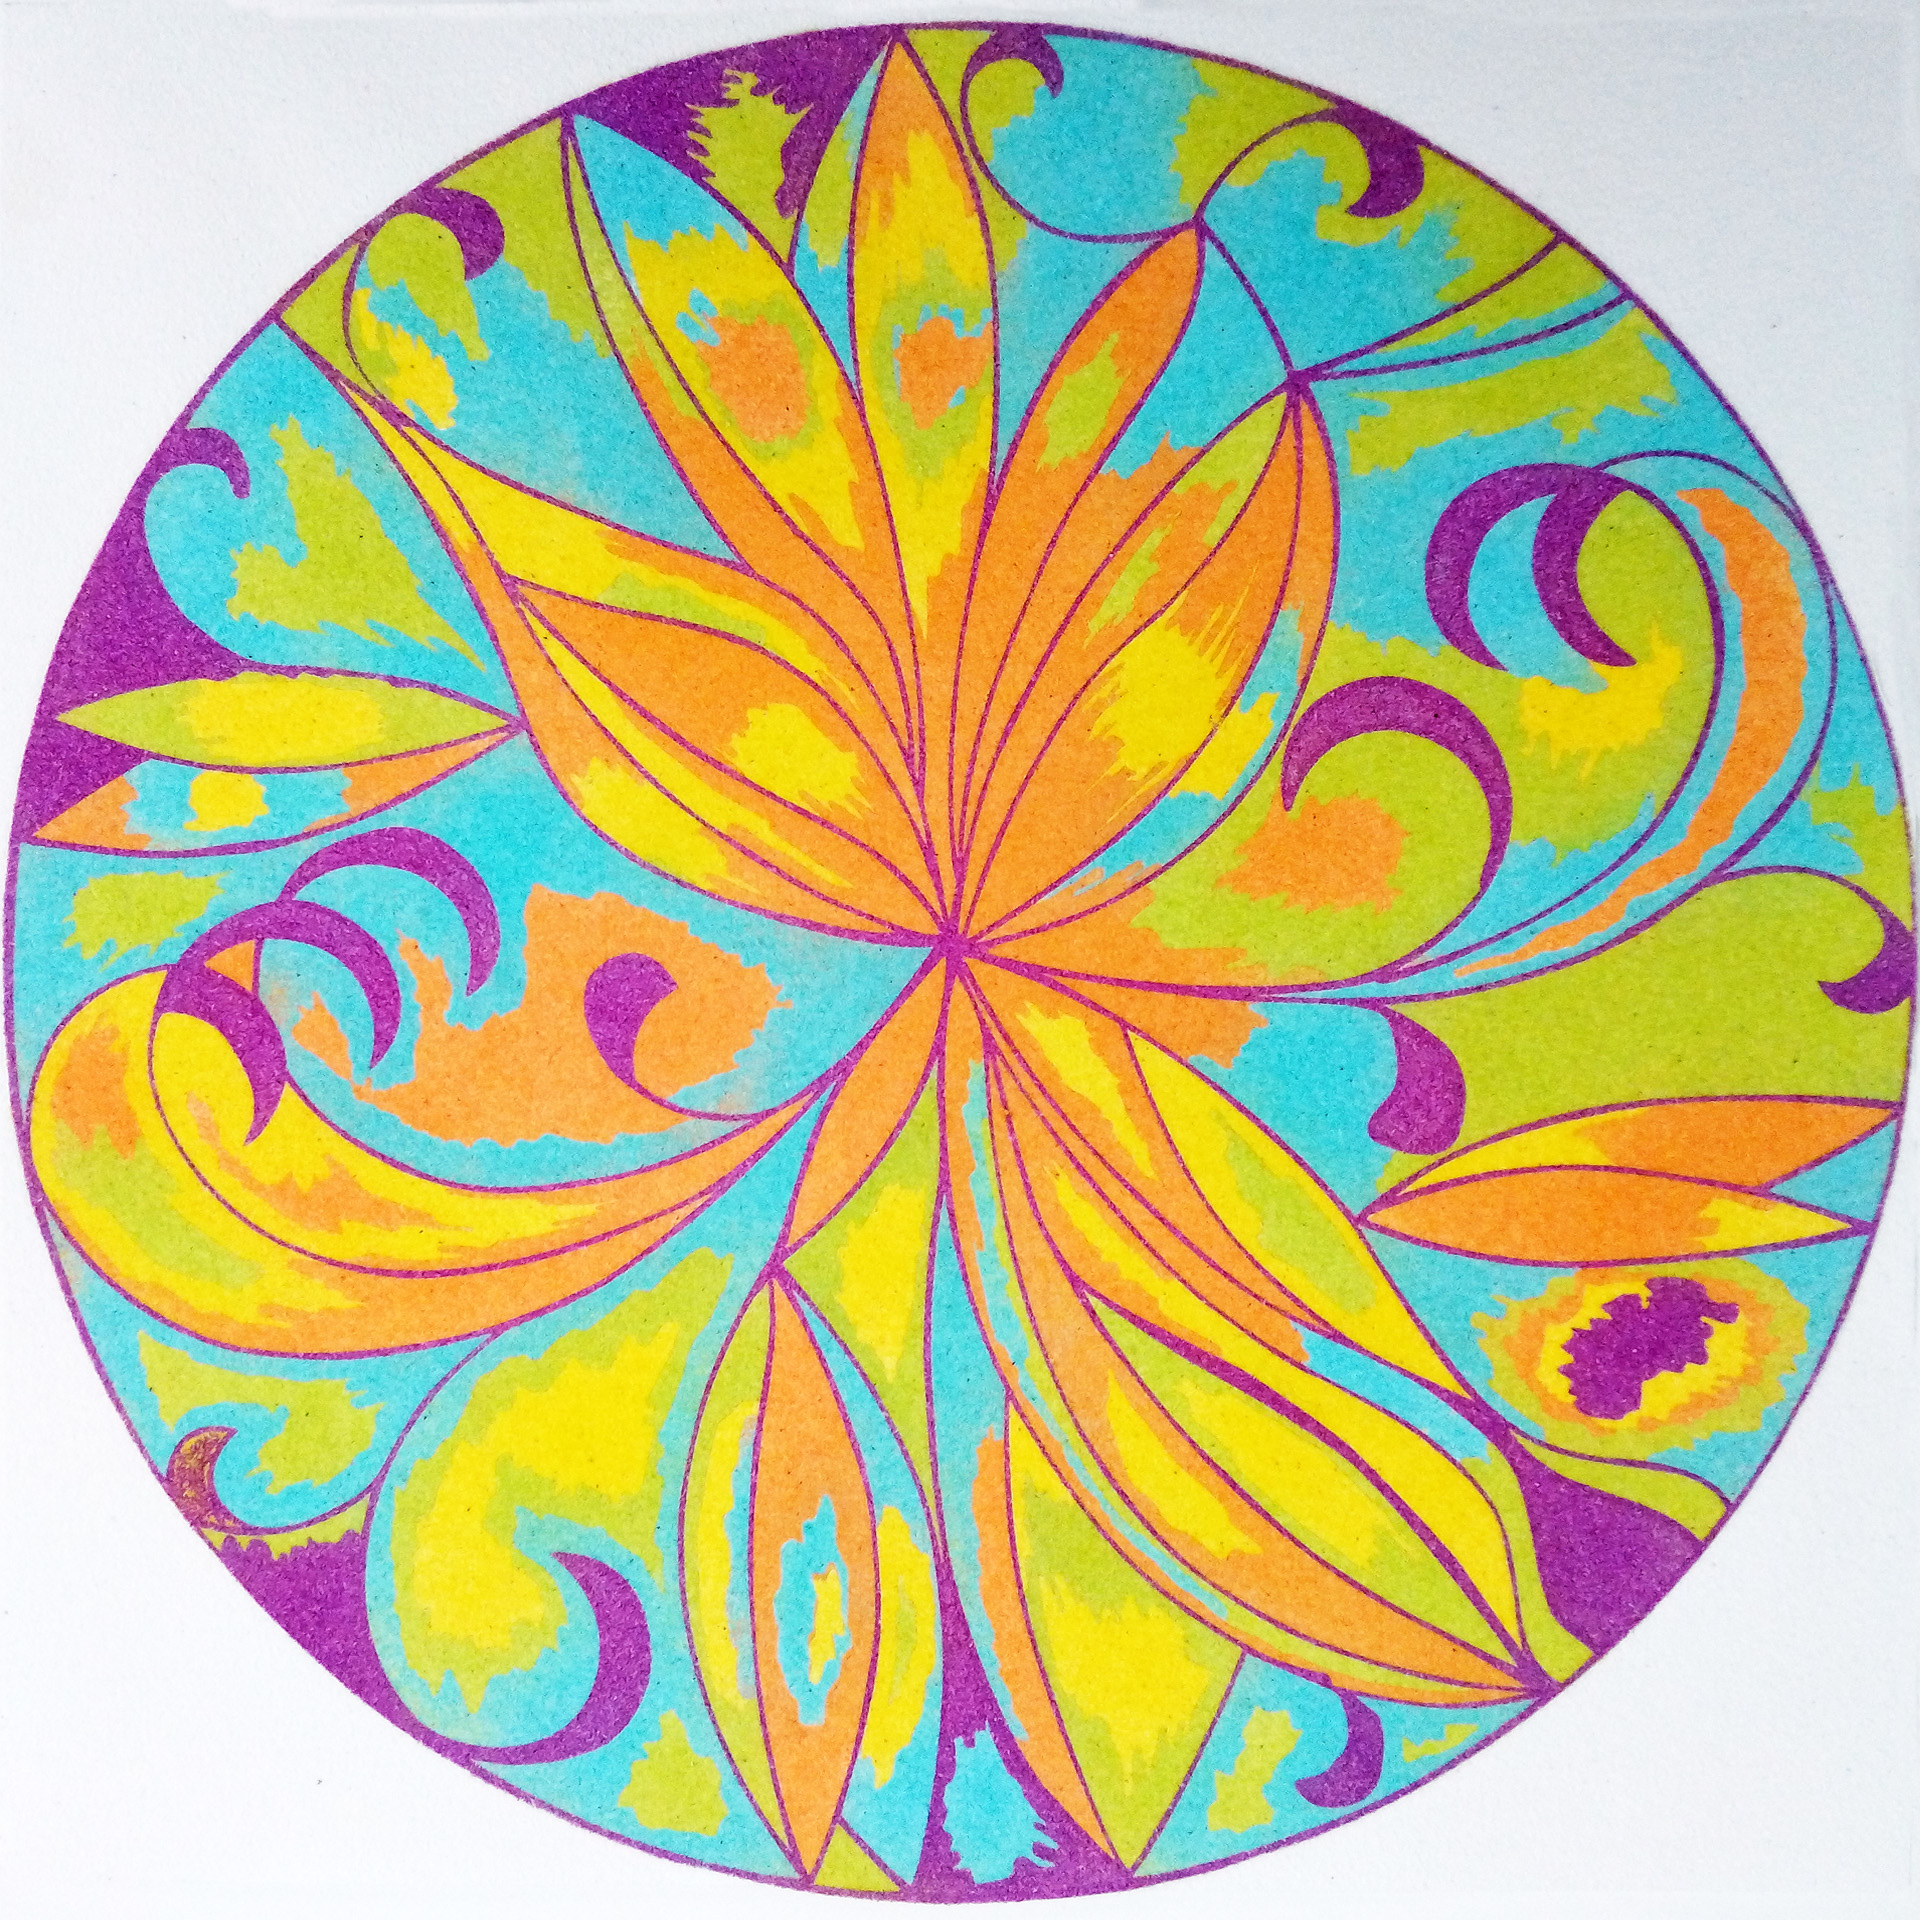 Mandala 2. 2 medidas